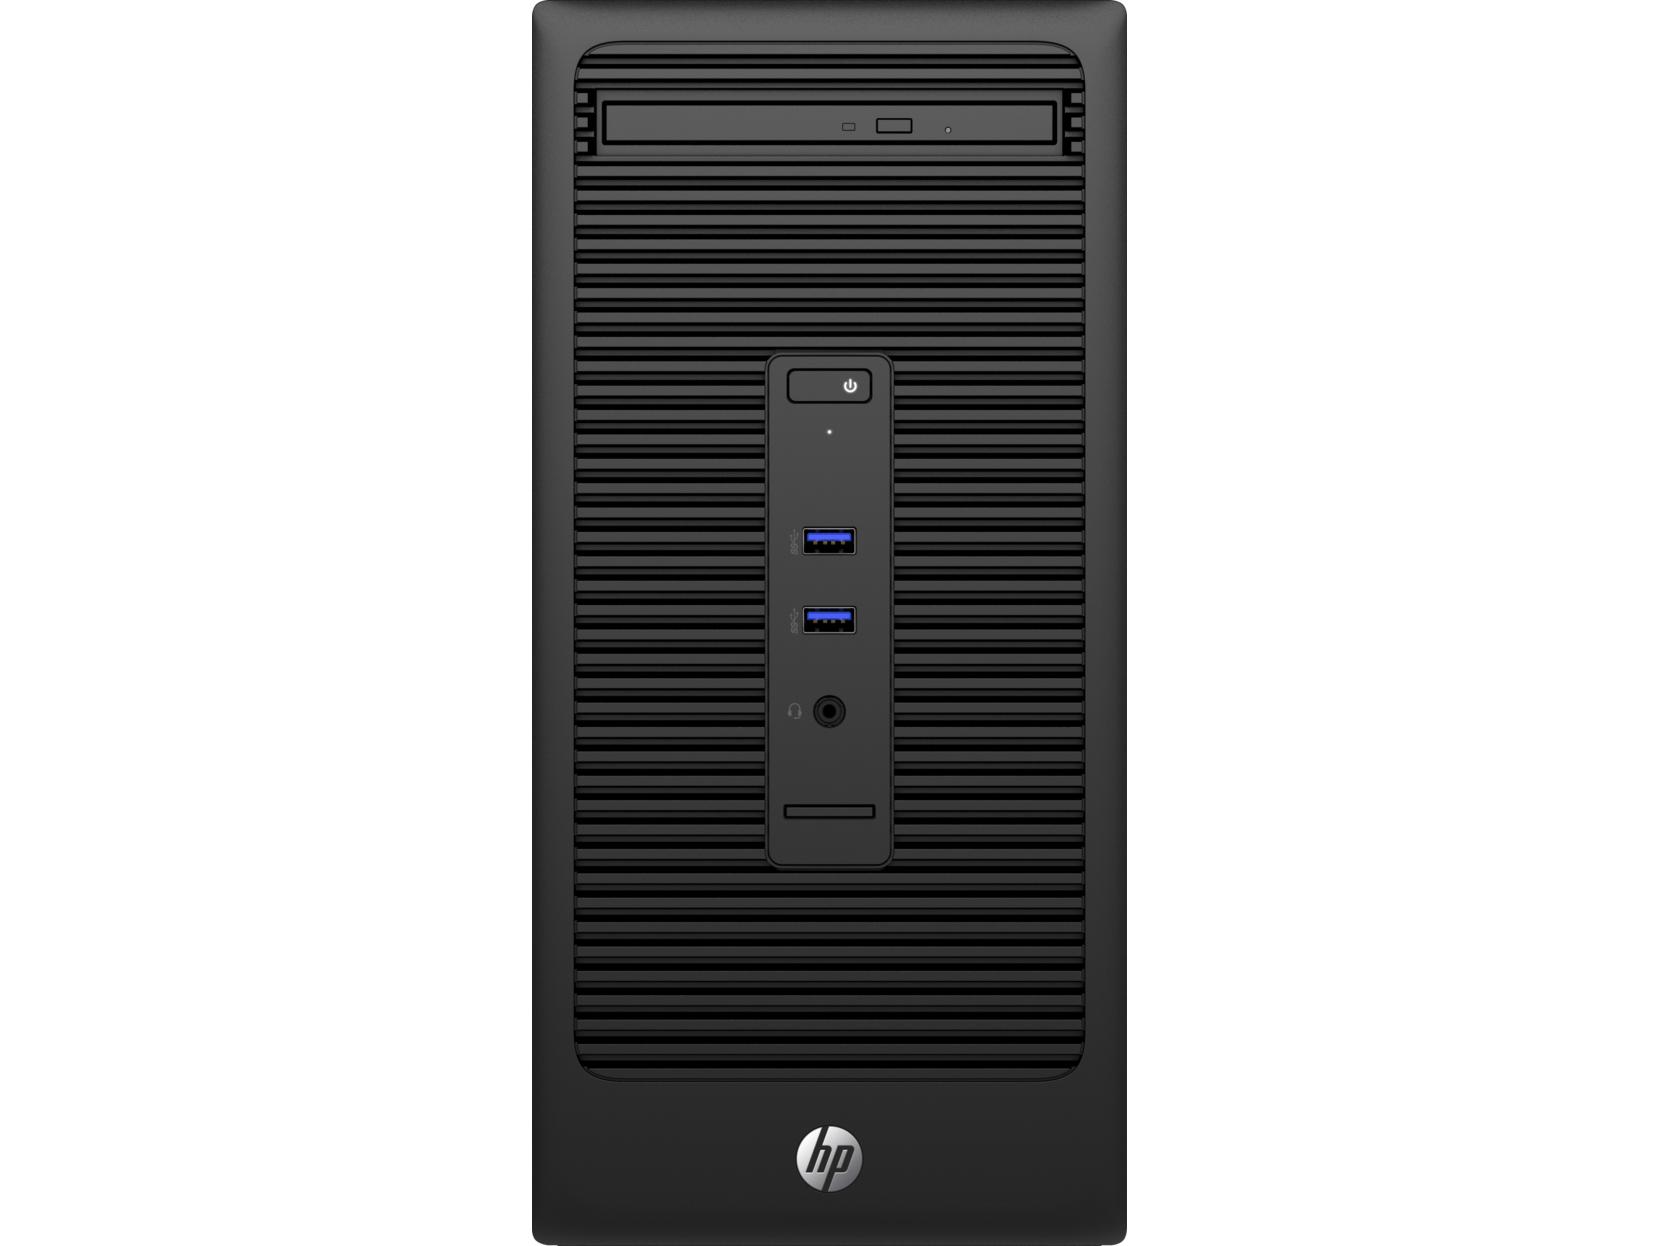 HP 280 G2 Microtower PC